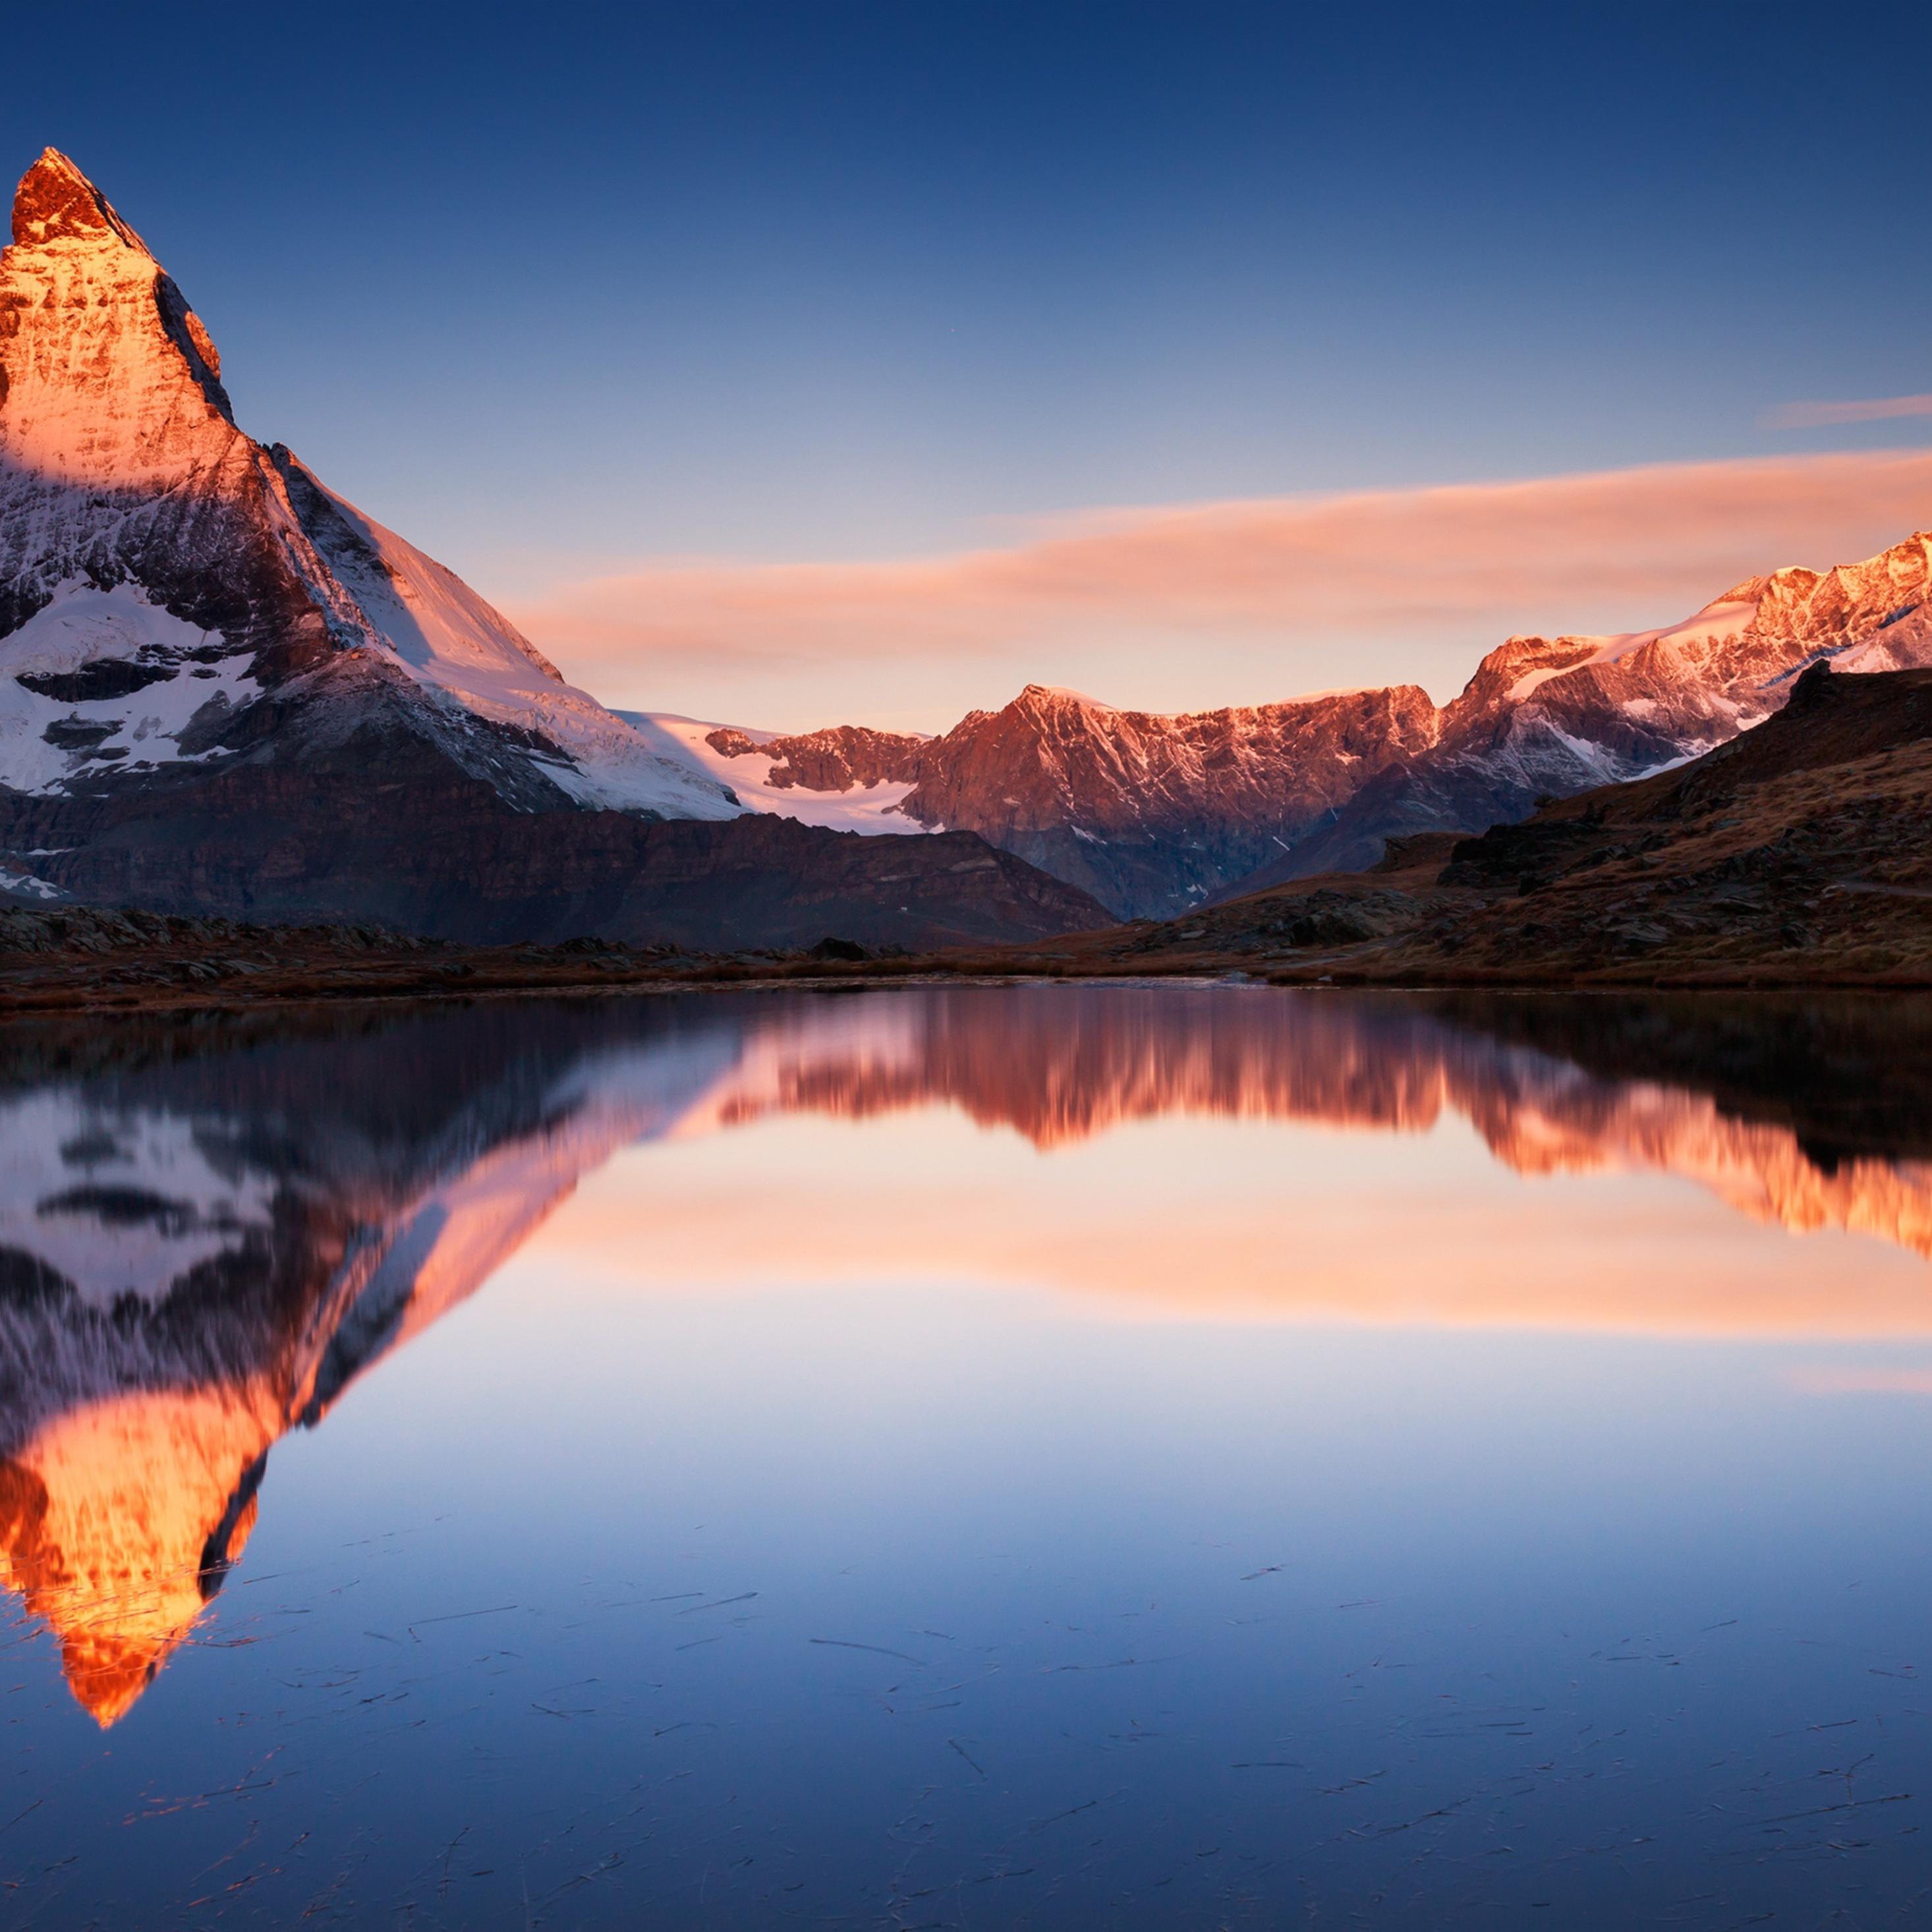 Good Wallpaper Mountain Ipad Pro - apple-mountains-lu-2932x2932  Best Photo Reference_113615.jpg